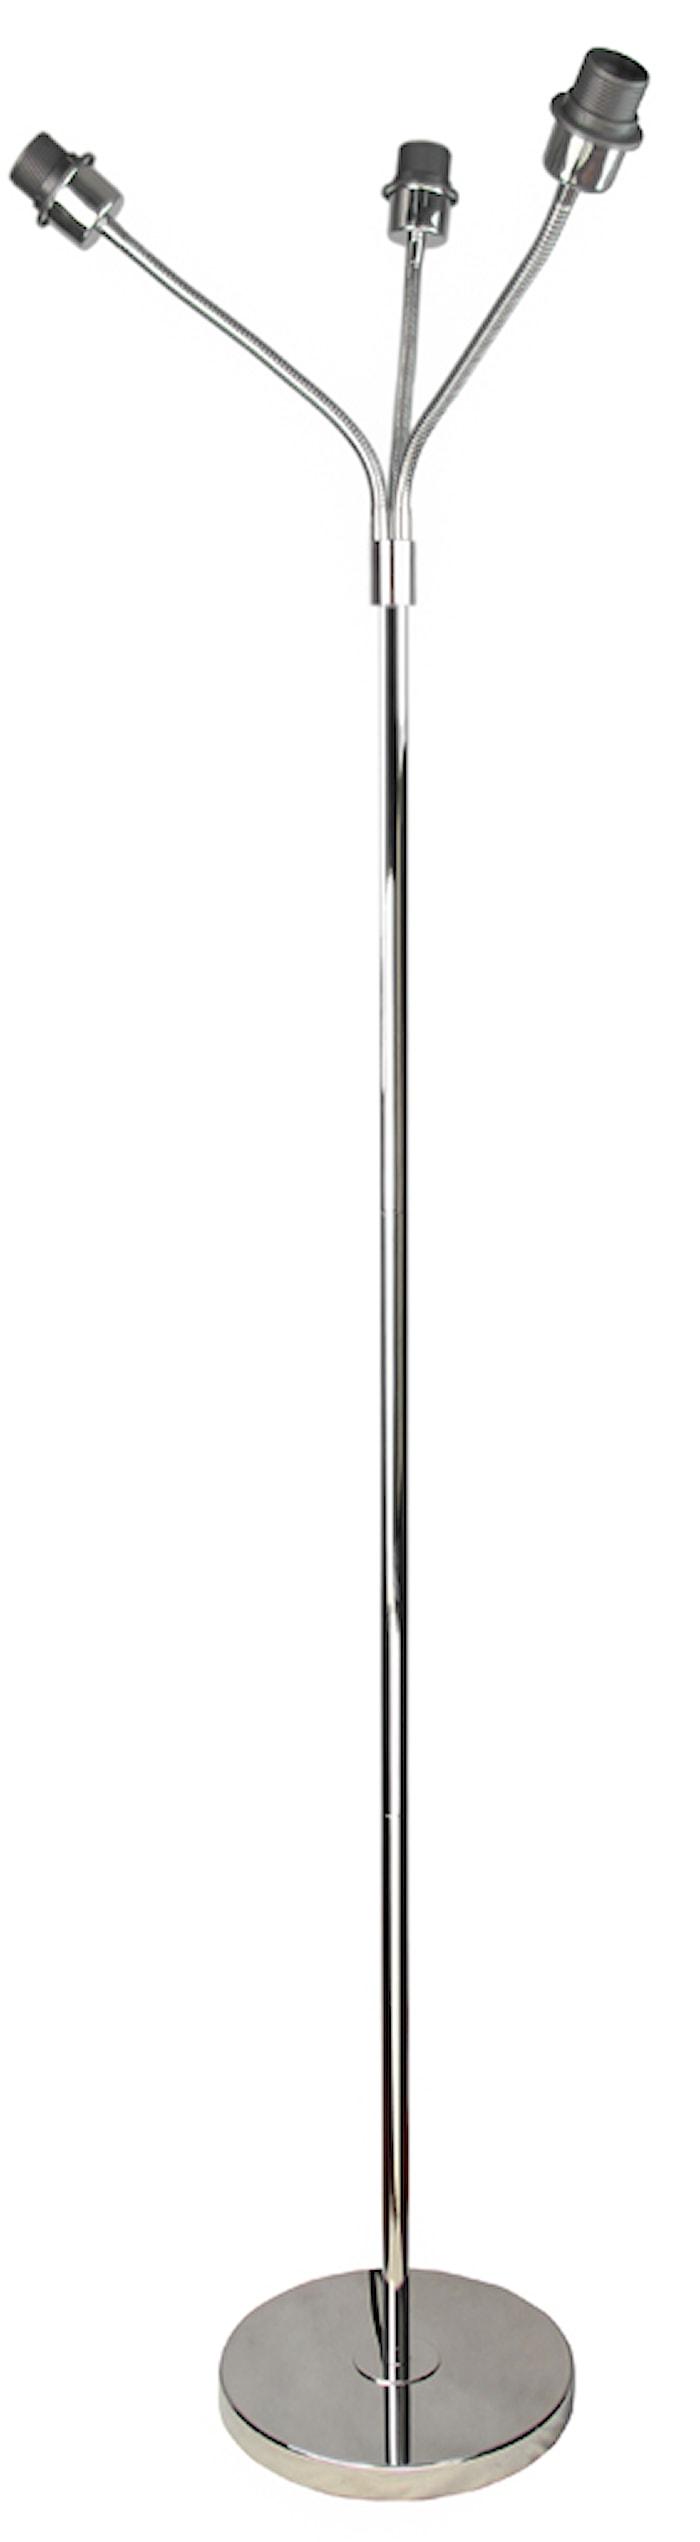 Cia Trearmad Golvfot Chrome 160cm